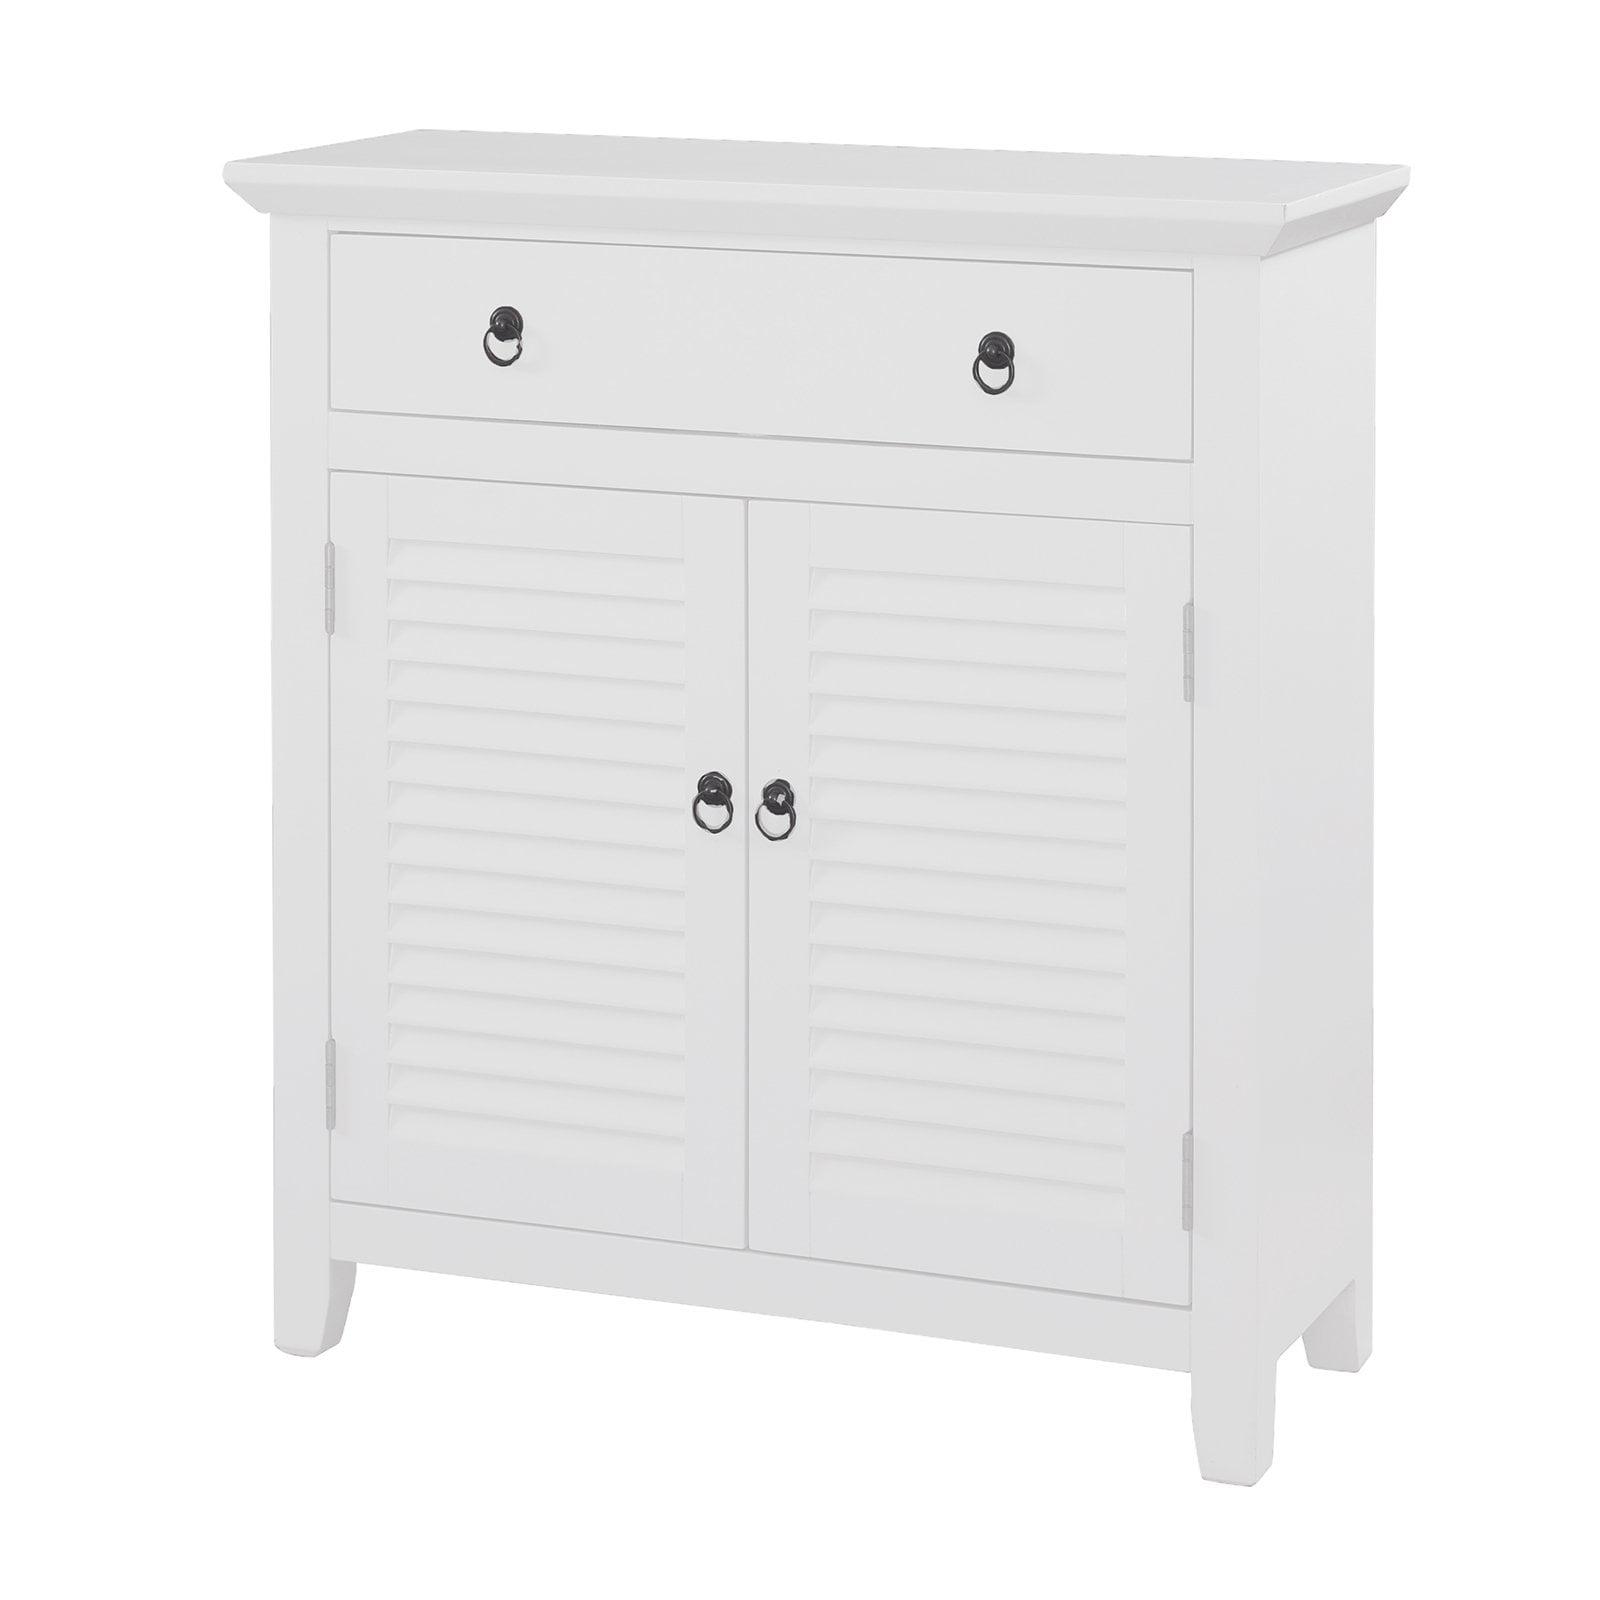 Shutter Door Console Cabinet, White - Walmart.com